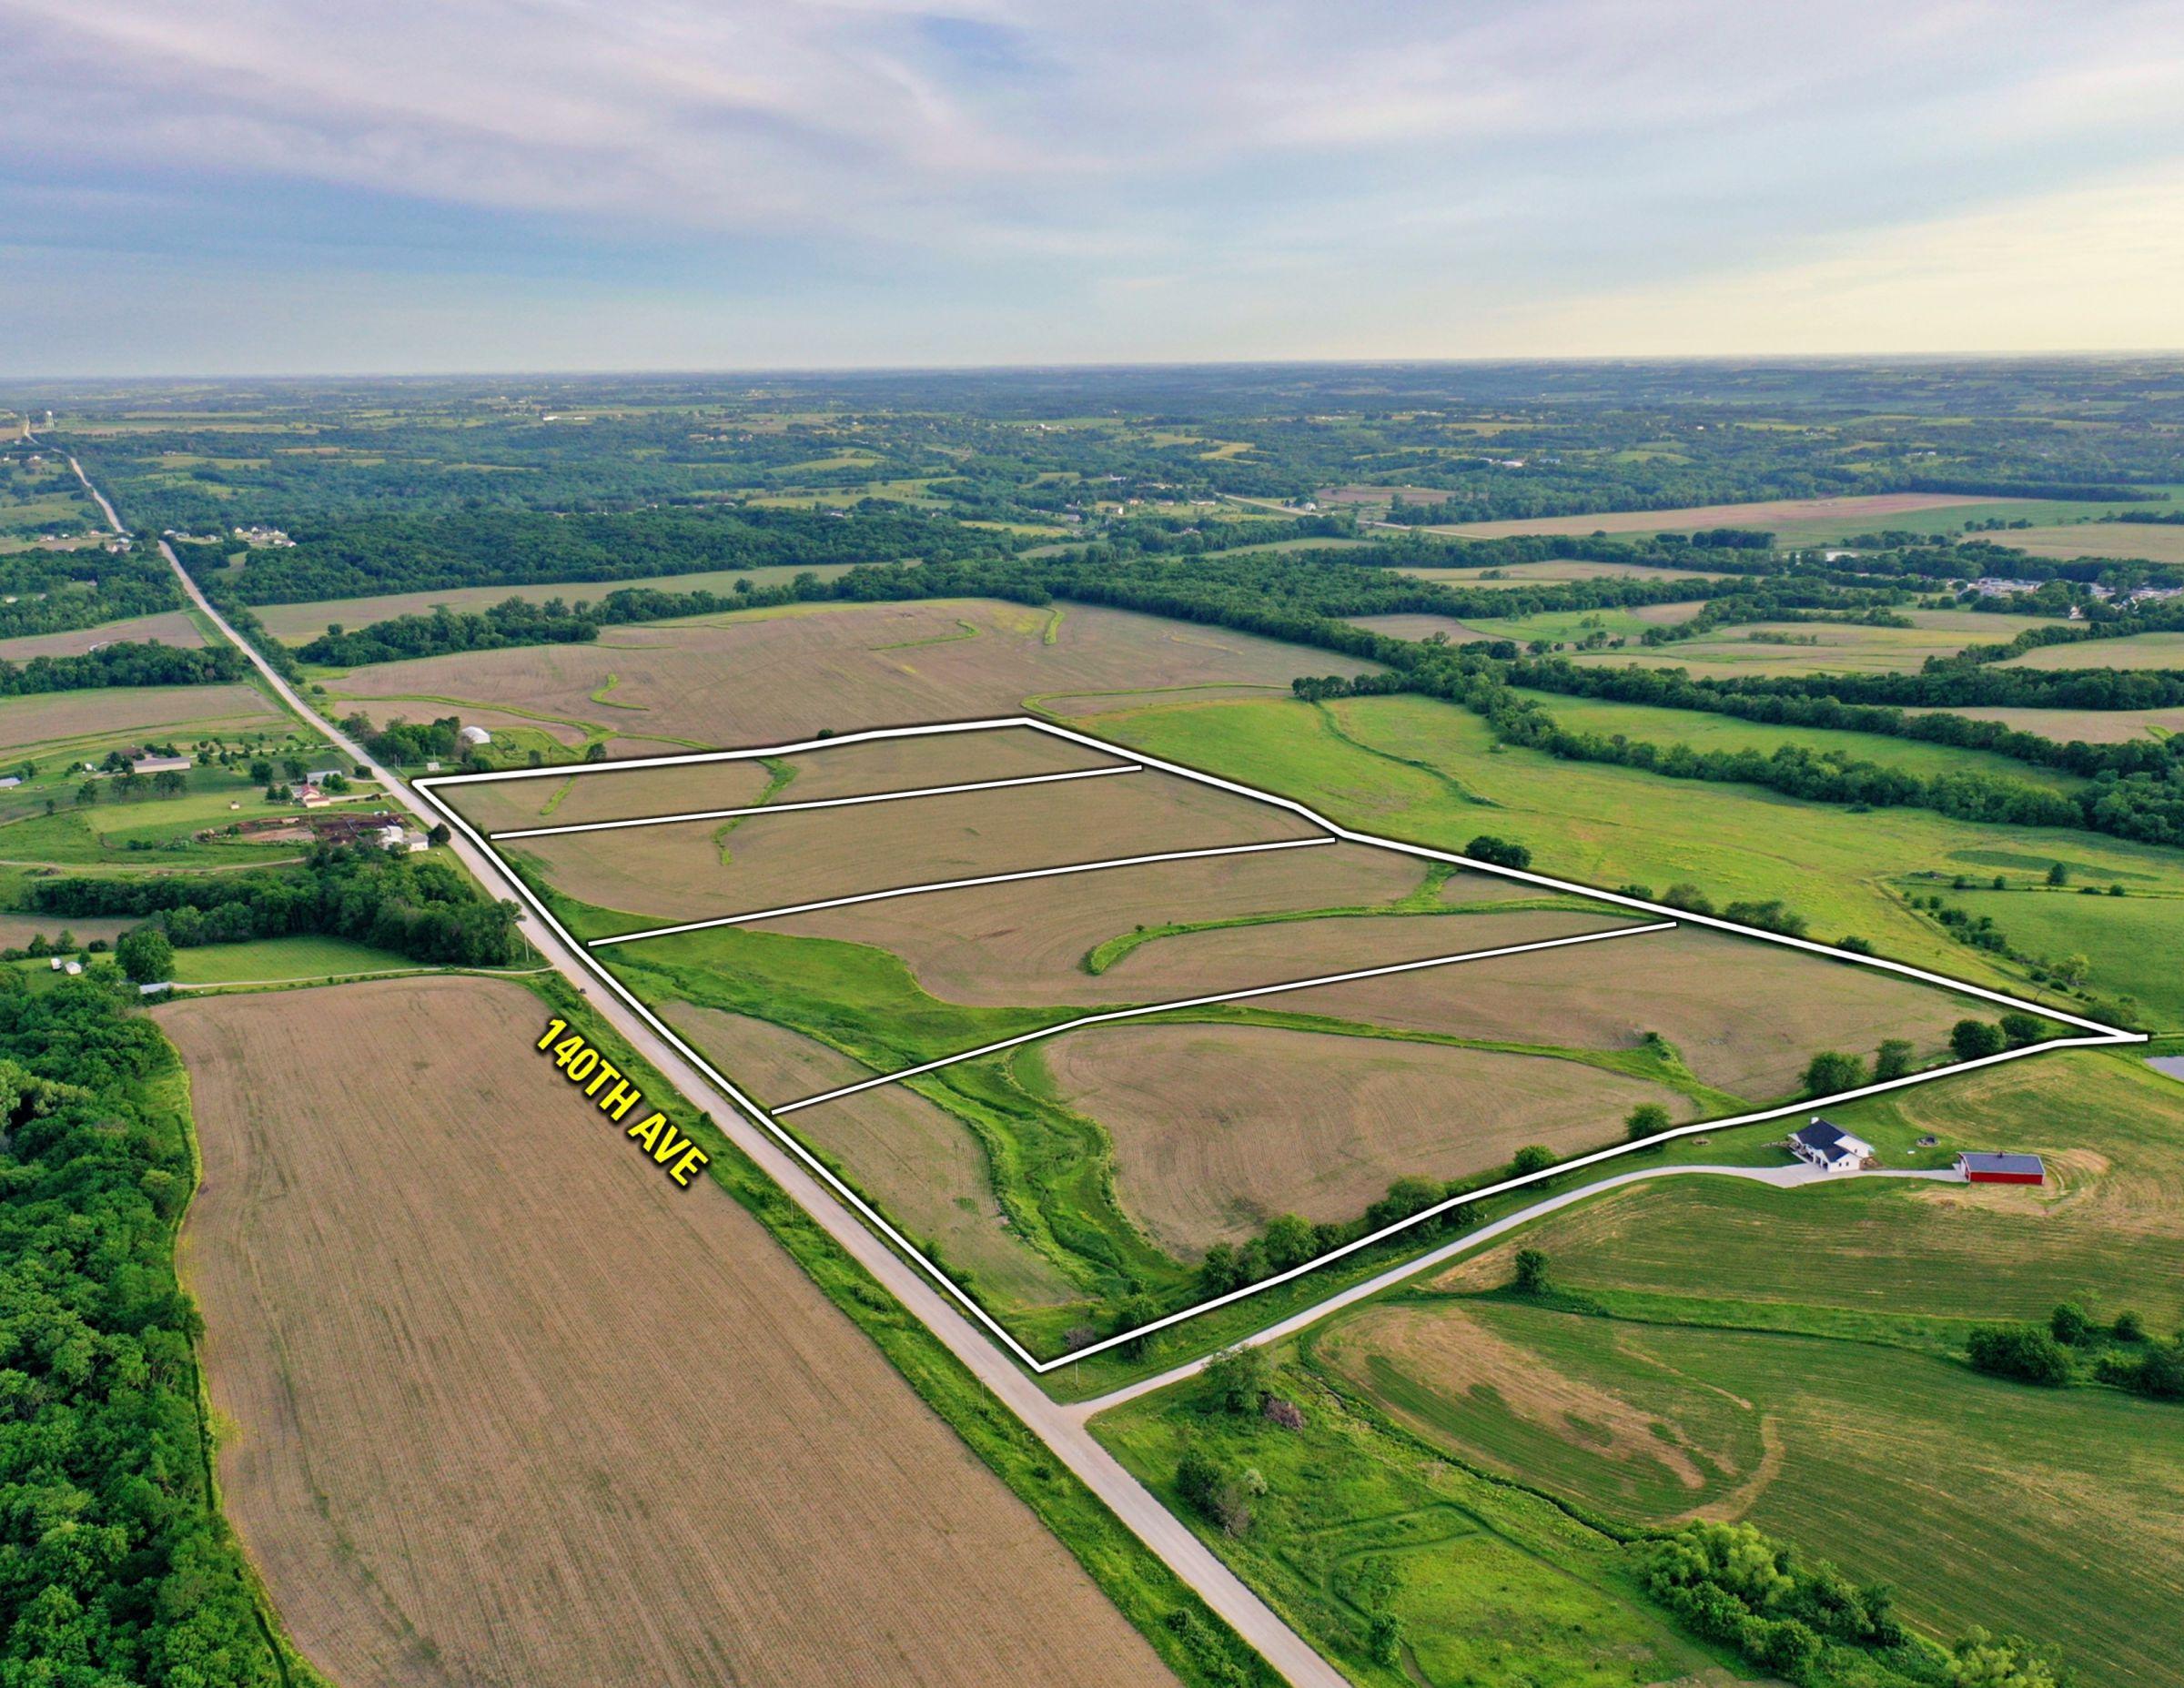 development-land-warren-county-iowa-20-acres-listing-number-15424-0-2021-03-26-185017.jpg